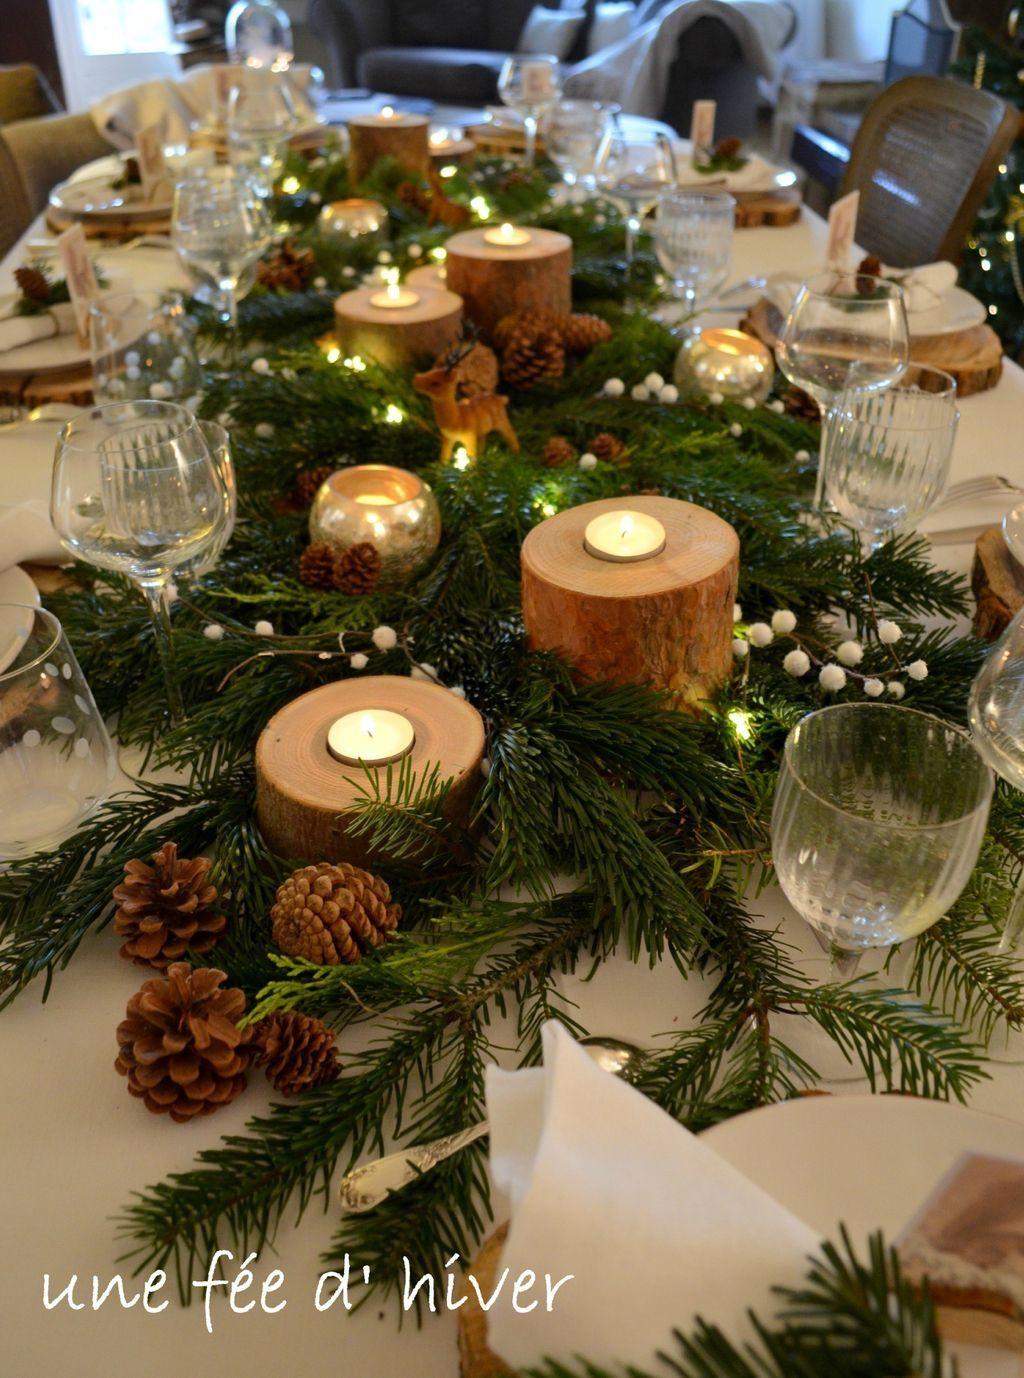 Cool 99 Elegant Christmas Table Decoration Ideas More At Http 99bestdecor Co Christmas Centerpieces Christmas Table Decorations Christmas Table Centerpieces